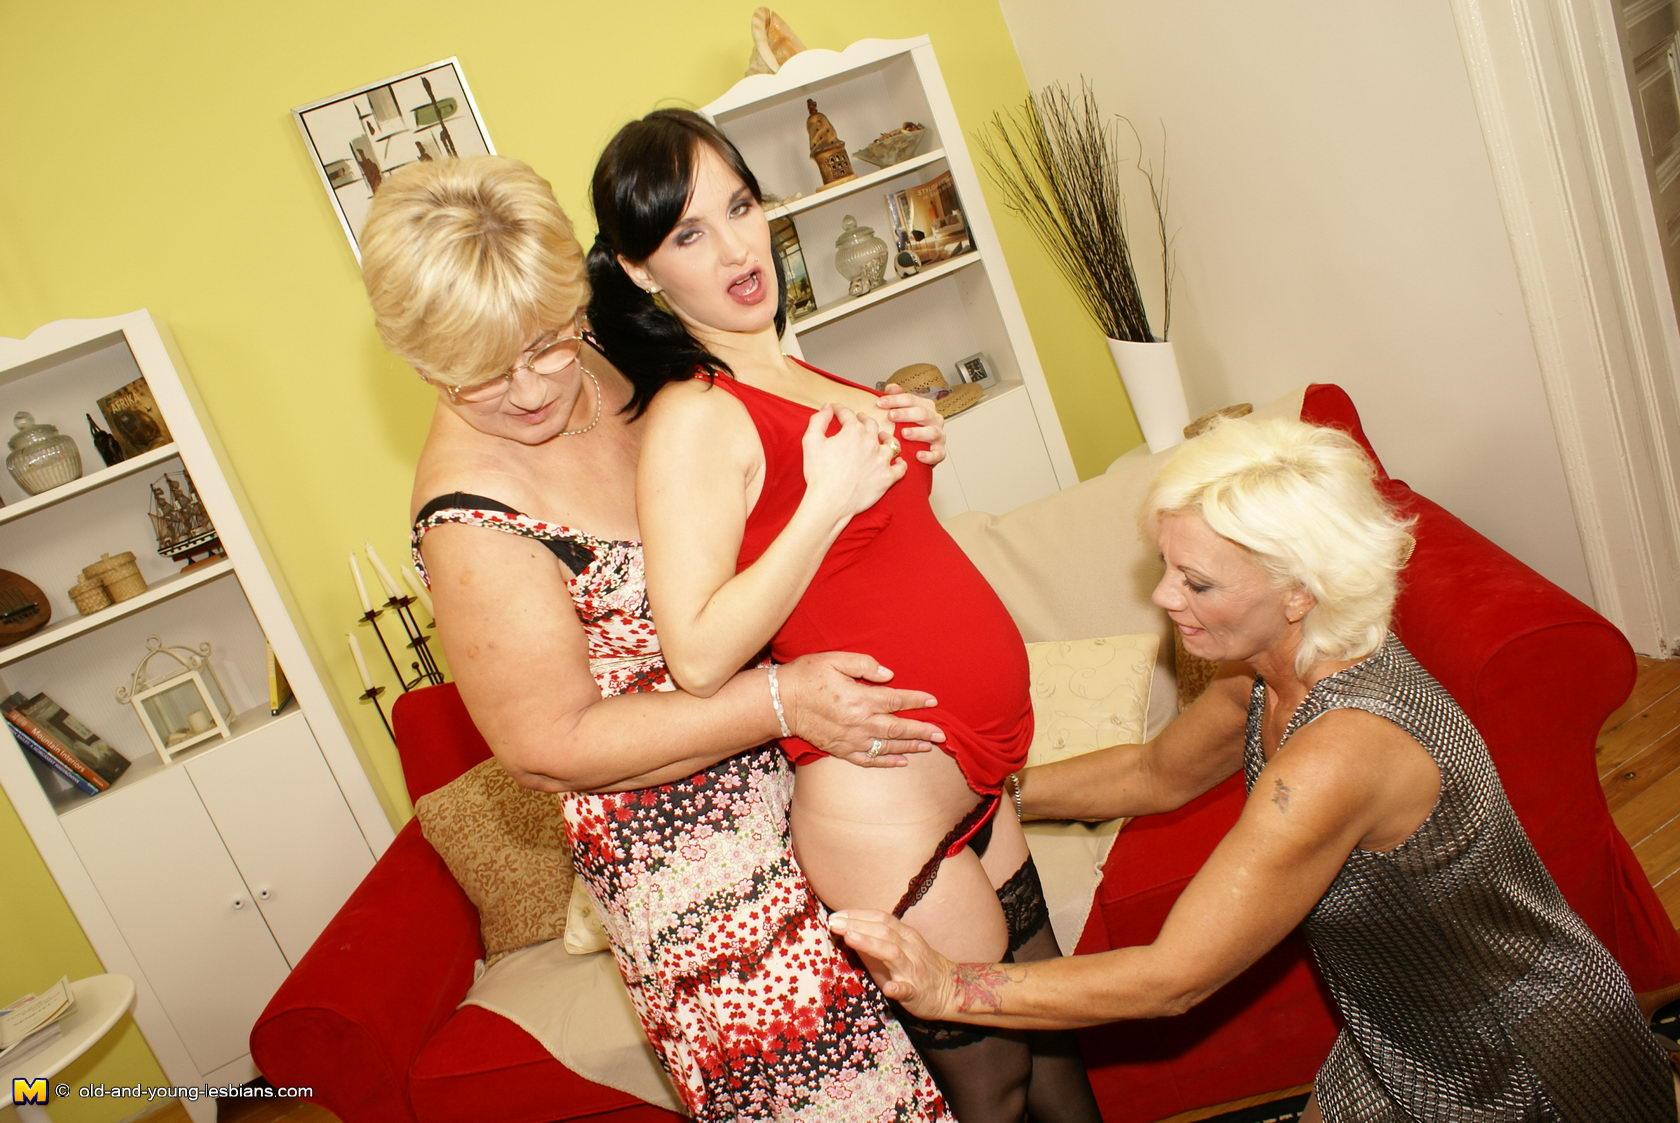 Two Blonde Lesbians Scissoring